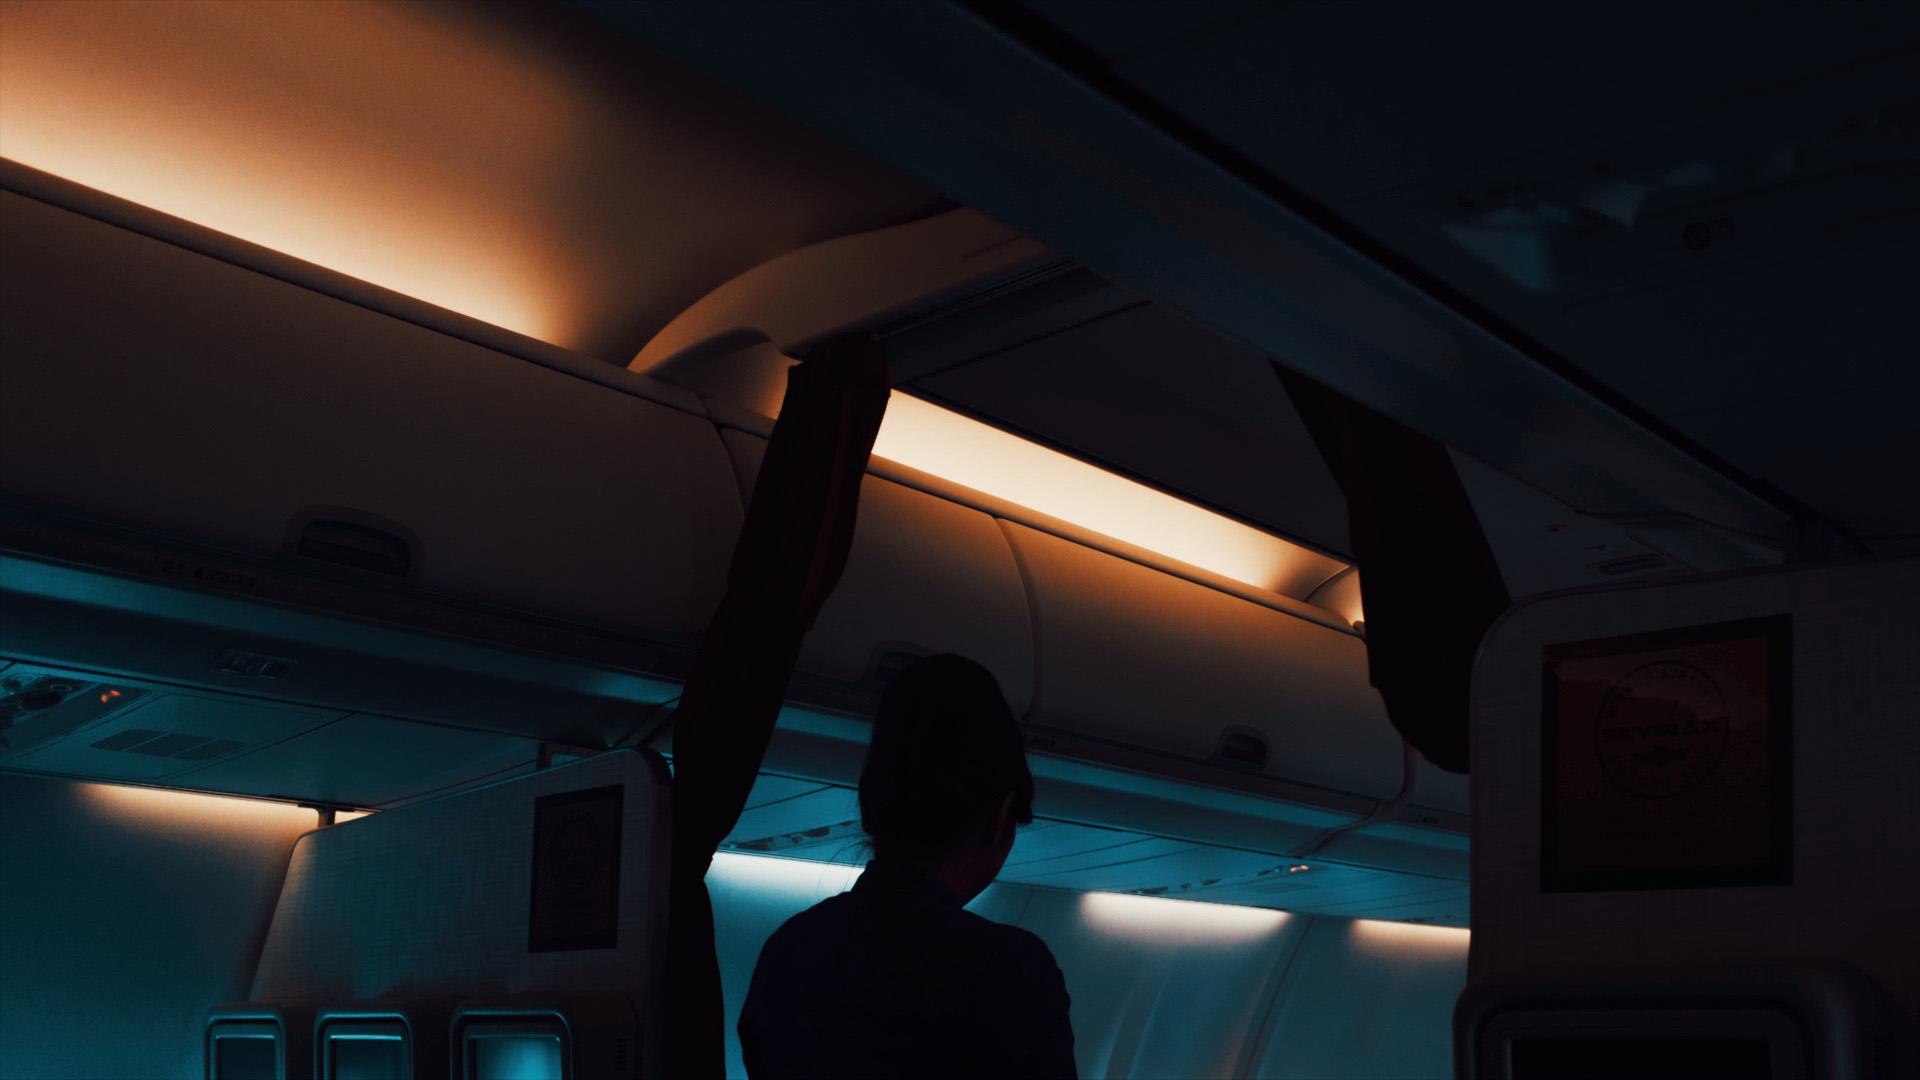 flight by jevgenij tichonov.jpg